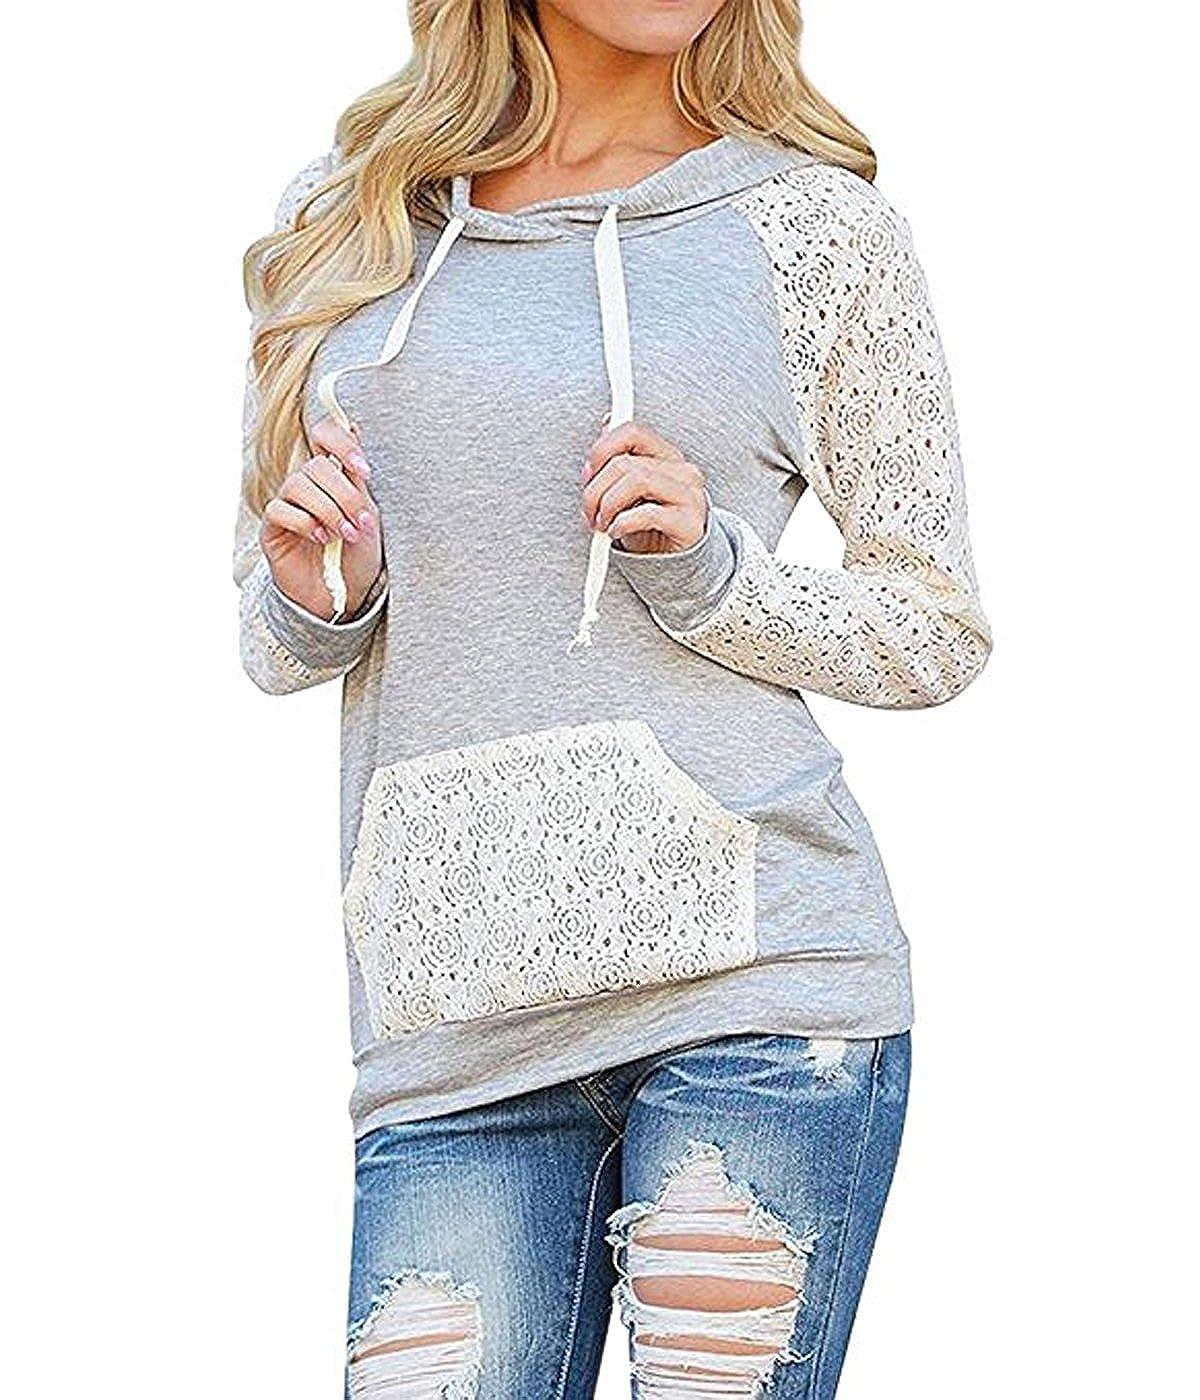 ZQYO Womens Long Sleeve Lace Drawstring Kangaroo Pocket Casual Pullover Hoodies Sweatshirt